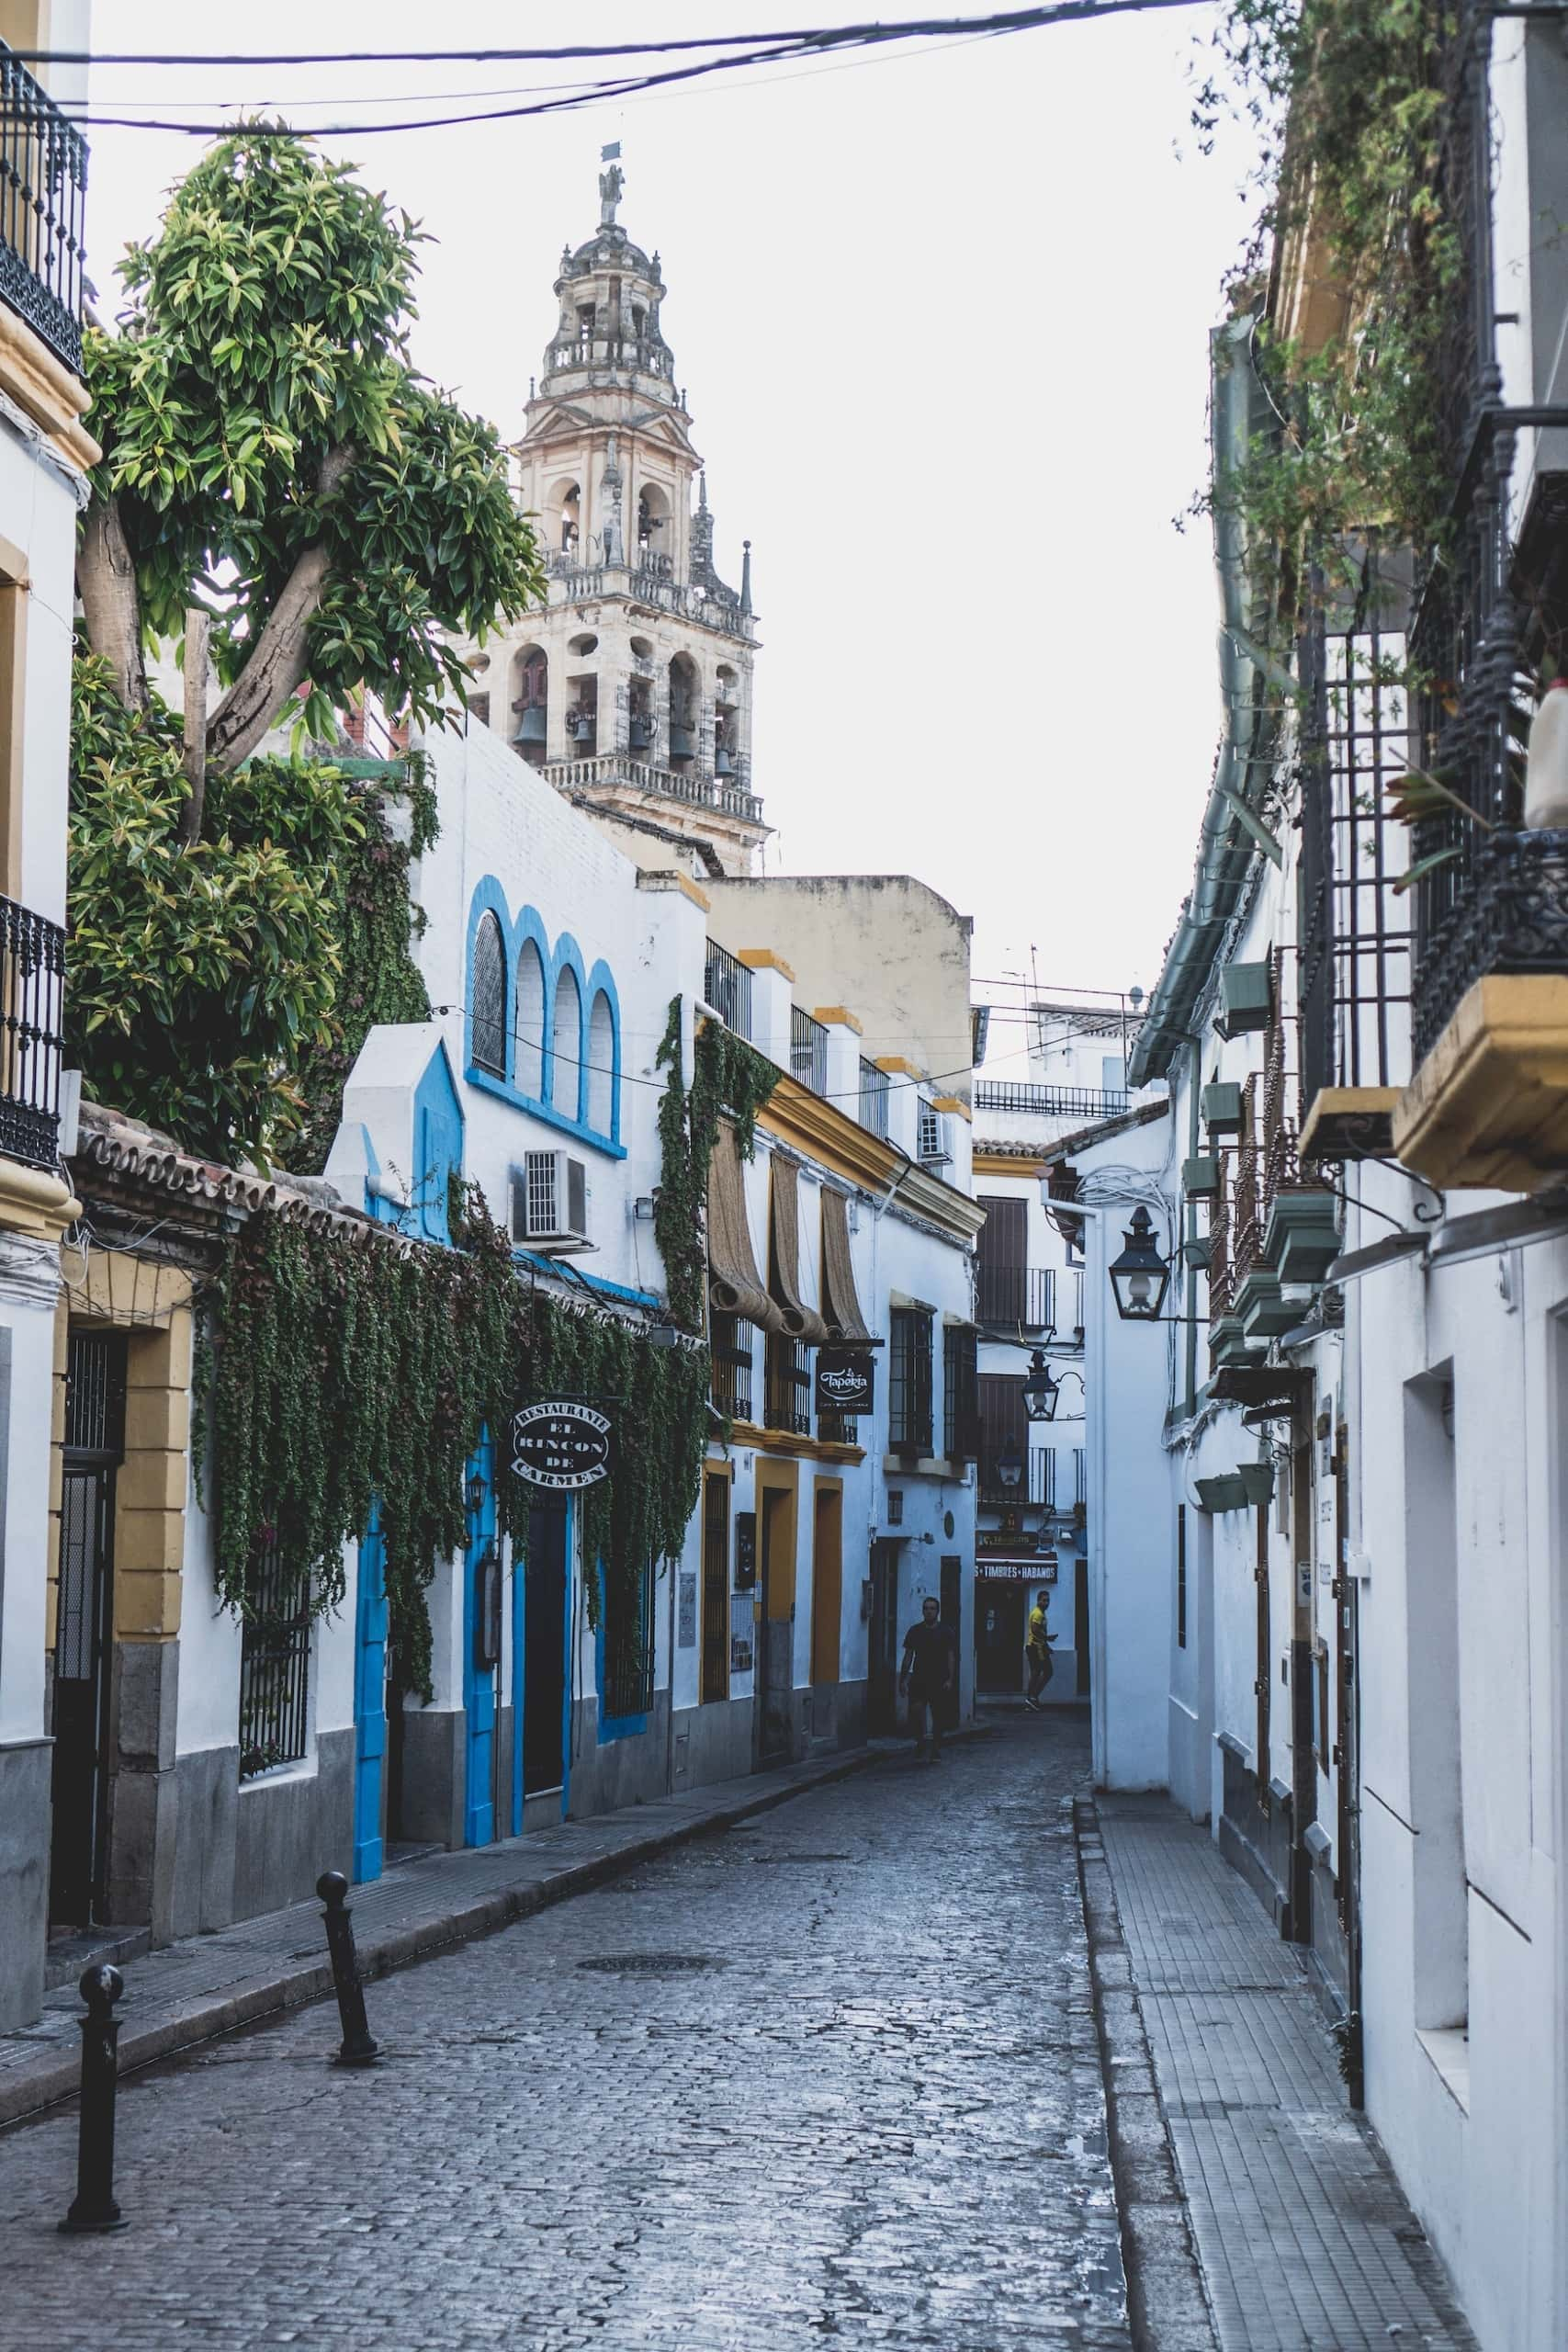 Stadtzentrum in Cordoba, Spanien